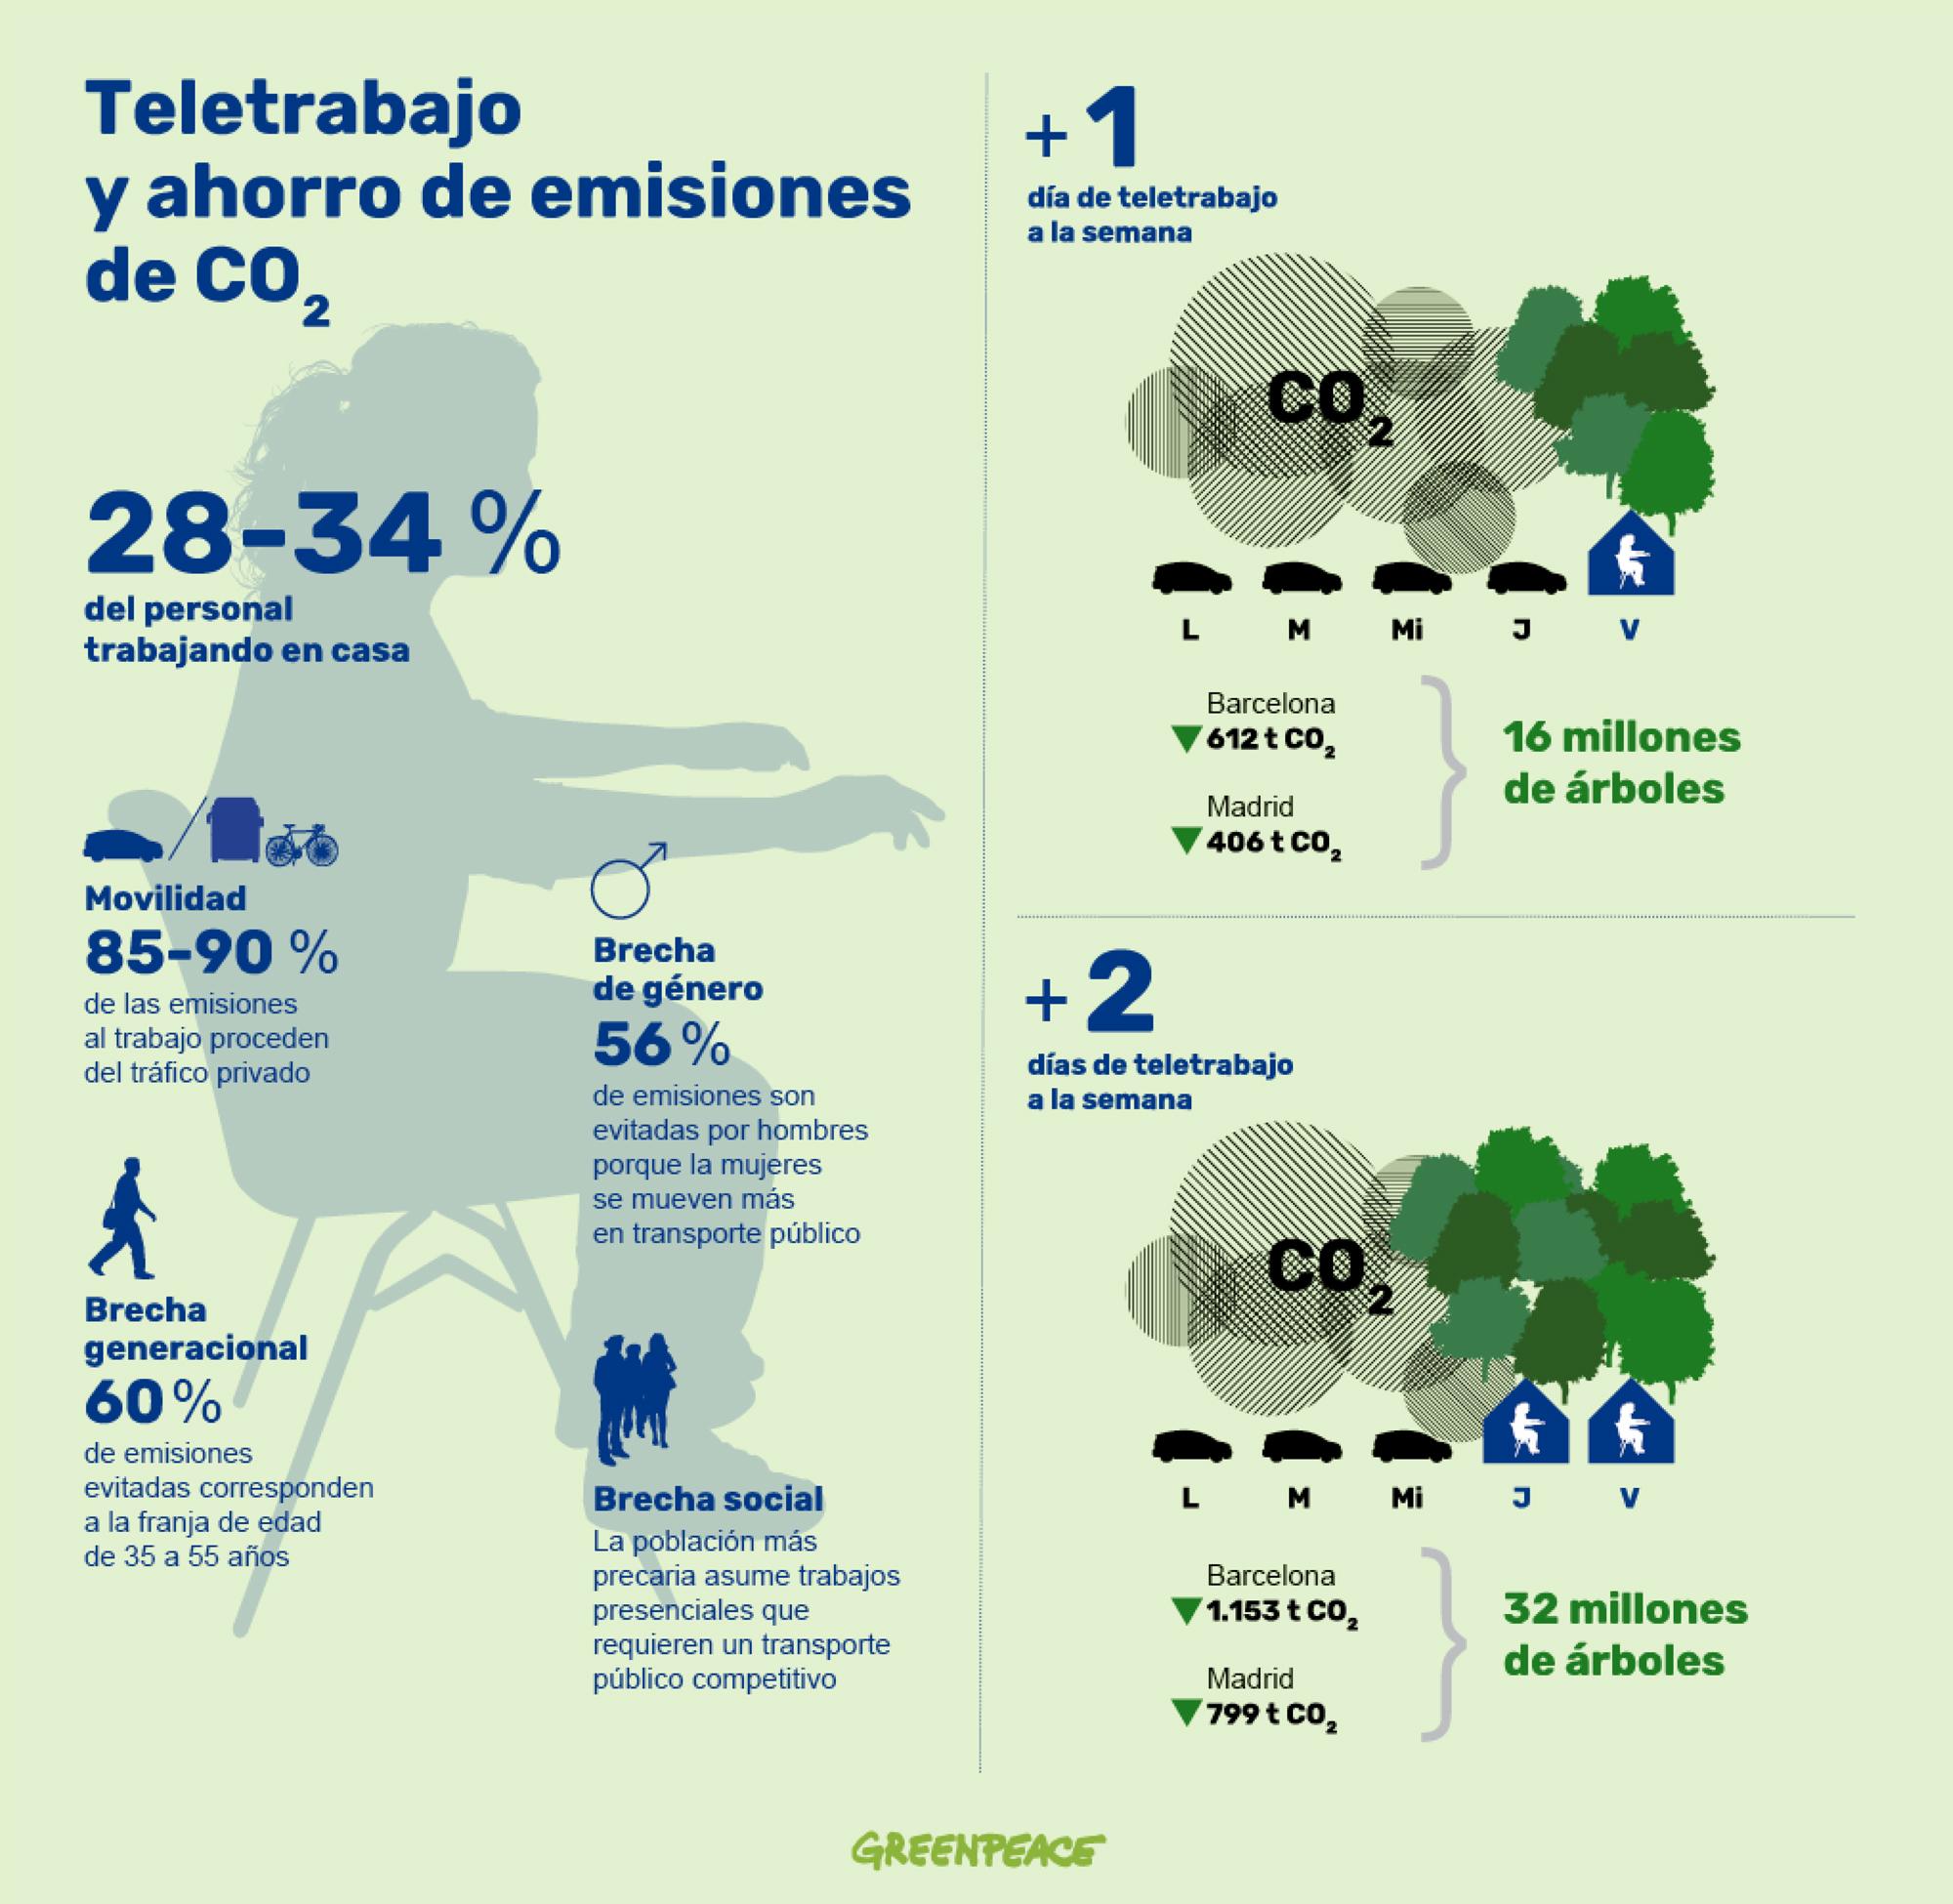 informe-greenpeace-teletrabajo